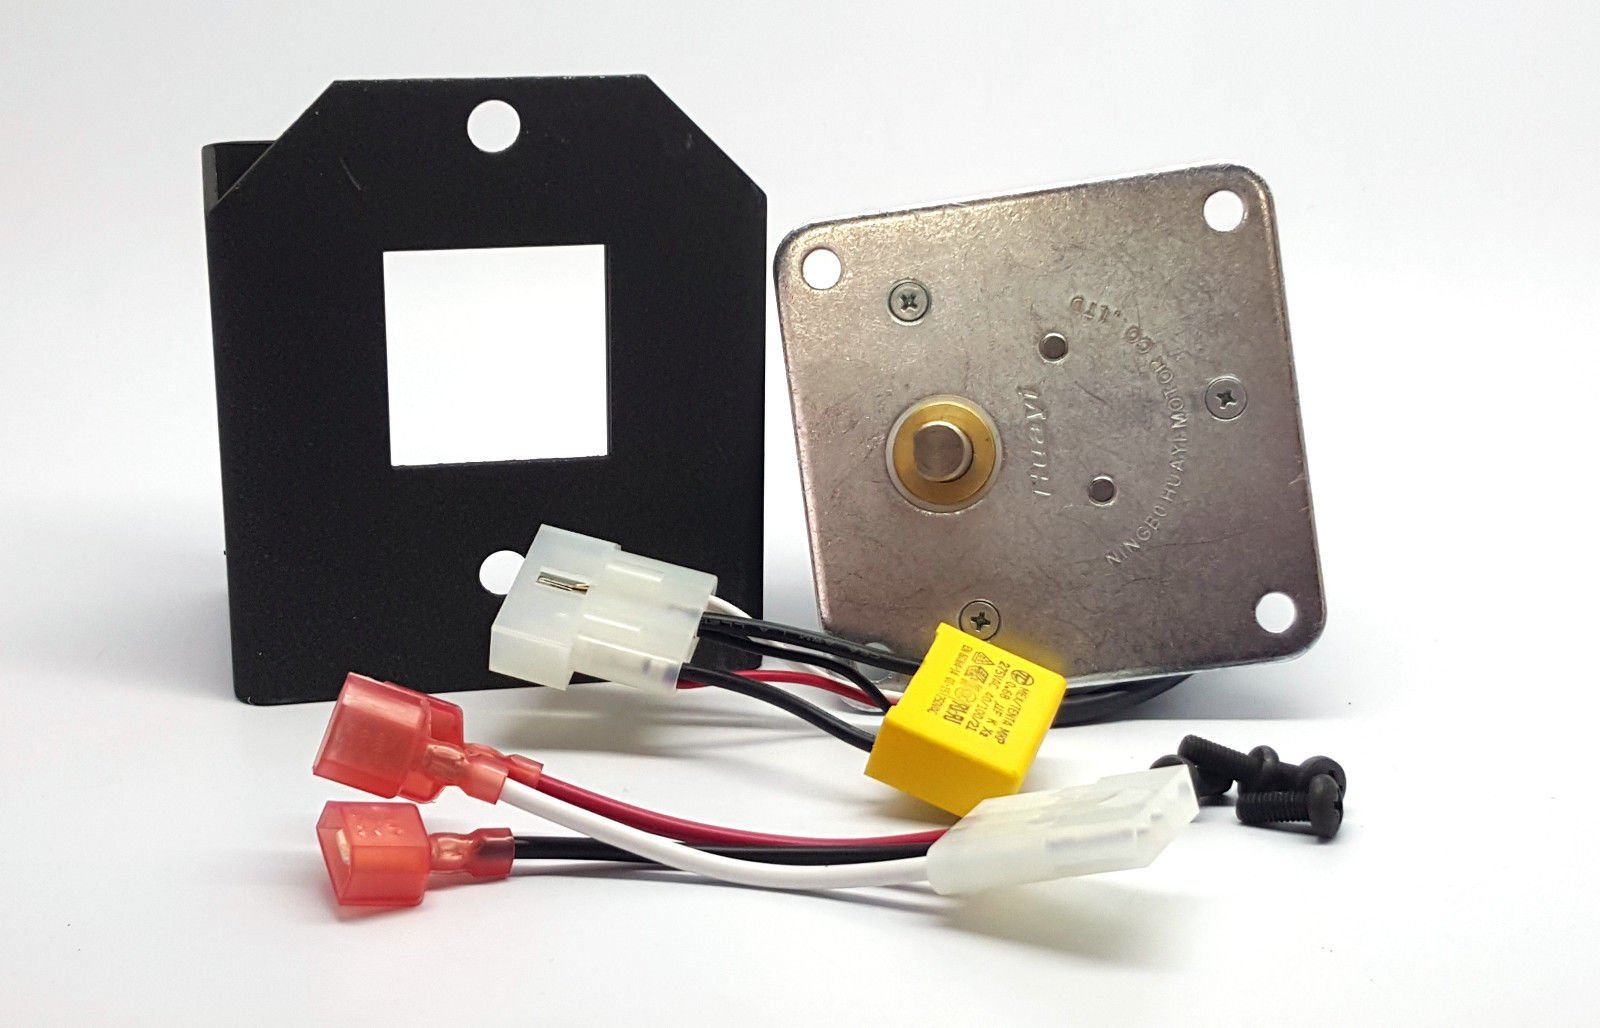 Heatilator Eco Choice Auger Feed Motor PS35, PS50, CAB50 812-4421, 7000-500 SALE+ FREE E-BOOK (FREEZING)